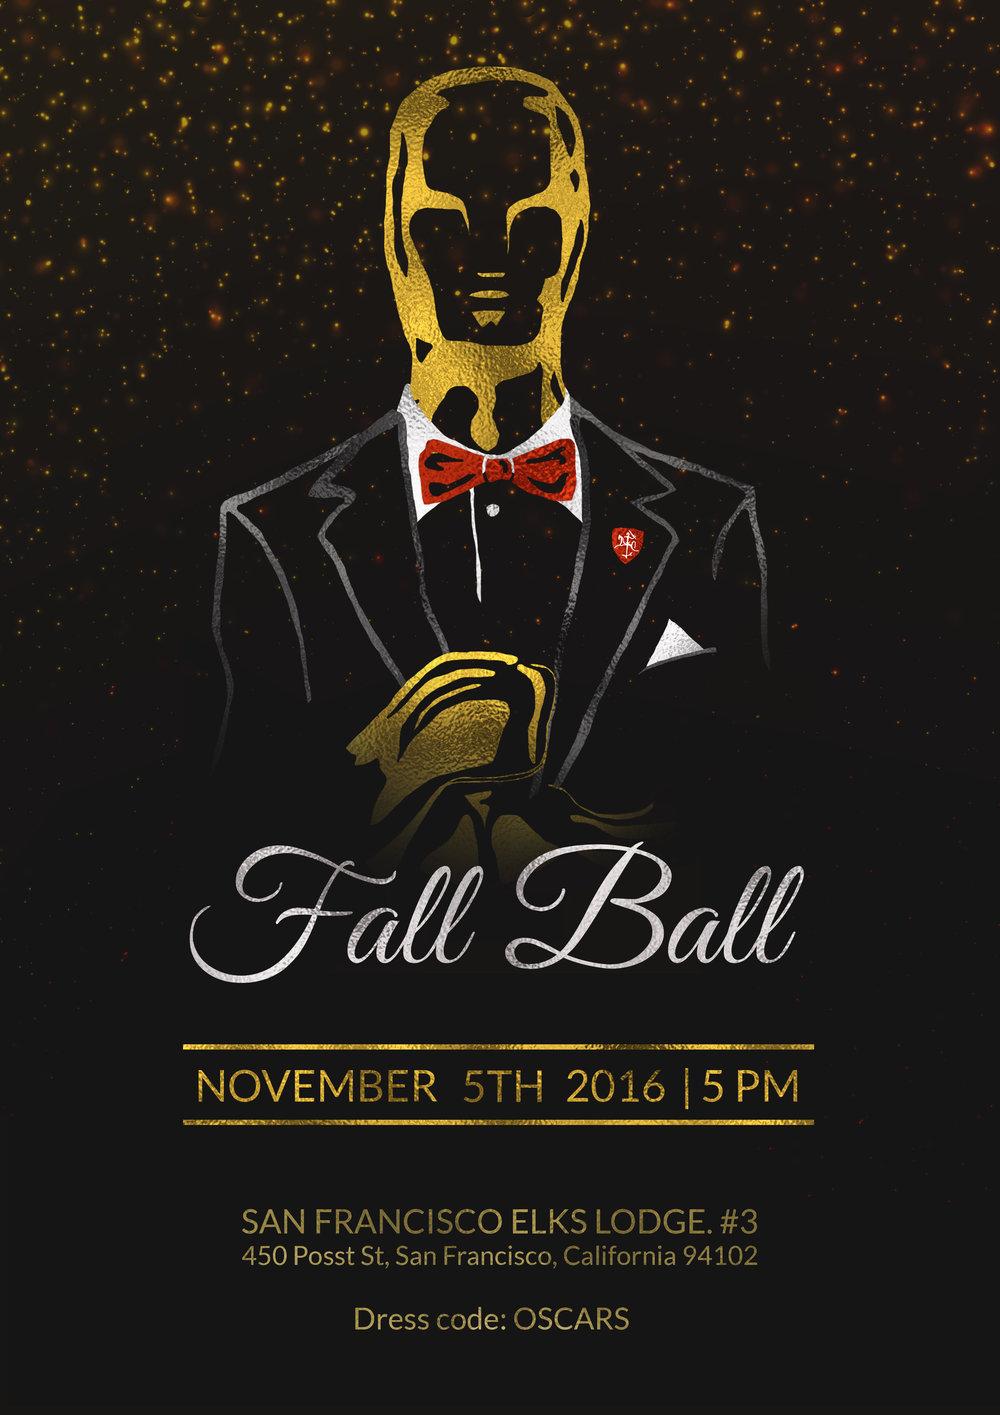 Fall Ball 2016